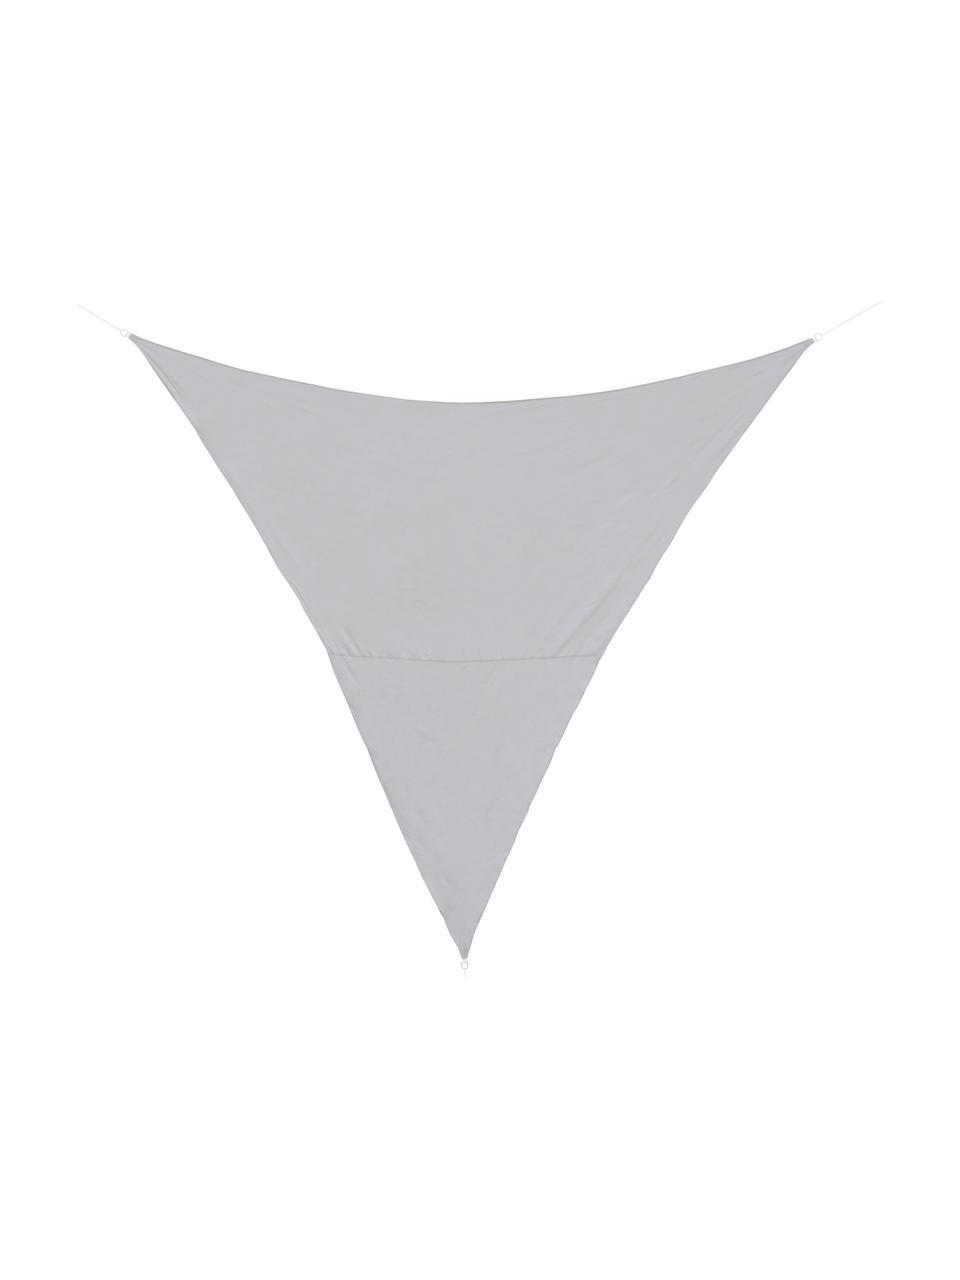 Graues Sonnensegel Triangle, 360 x 360 cm, Grau, 360 x 360 cm